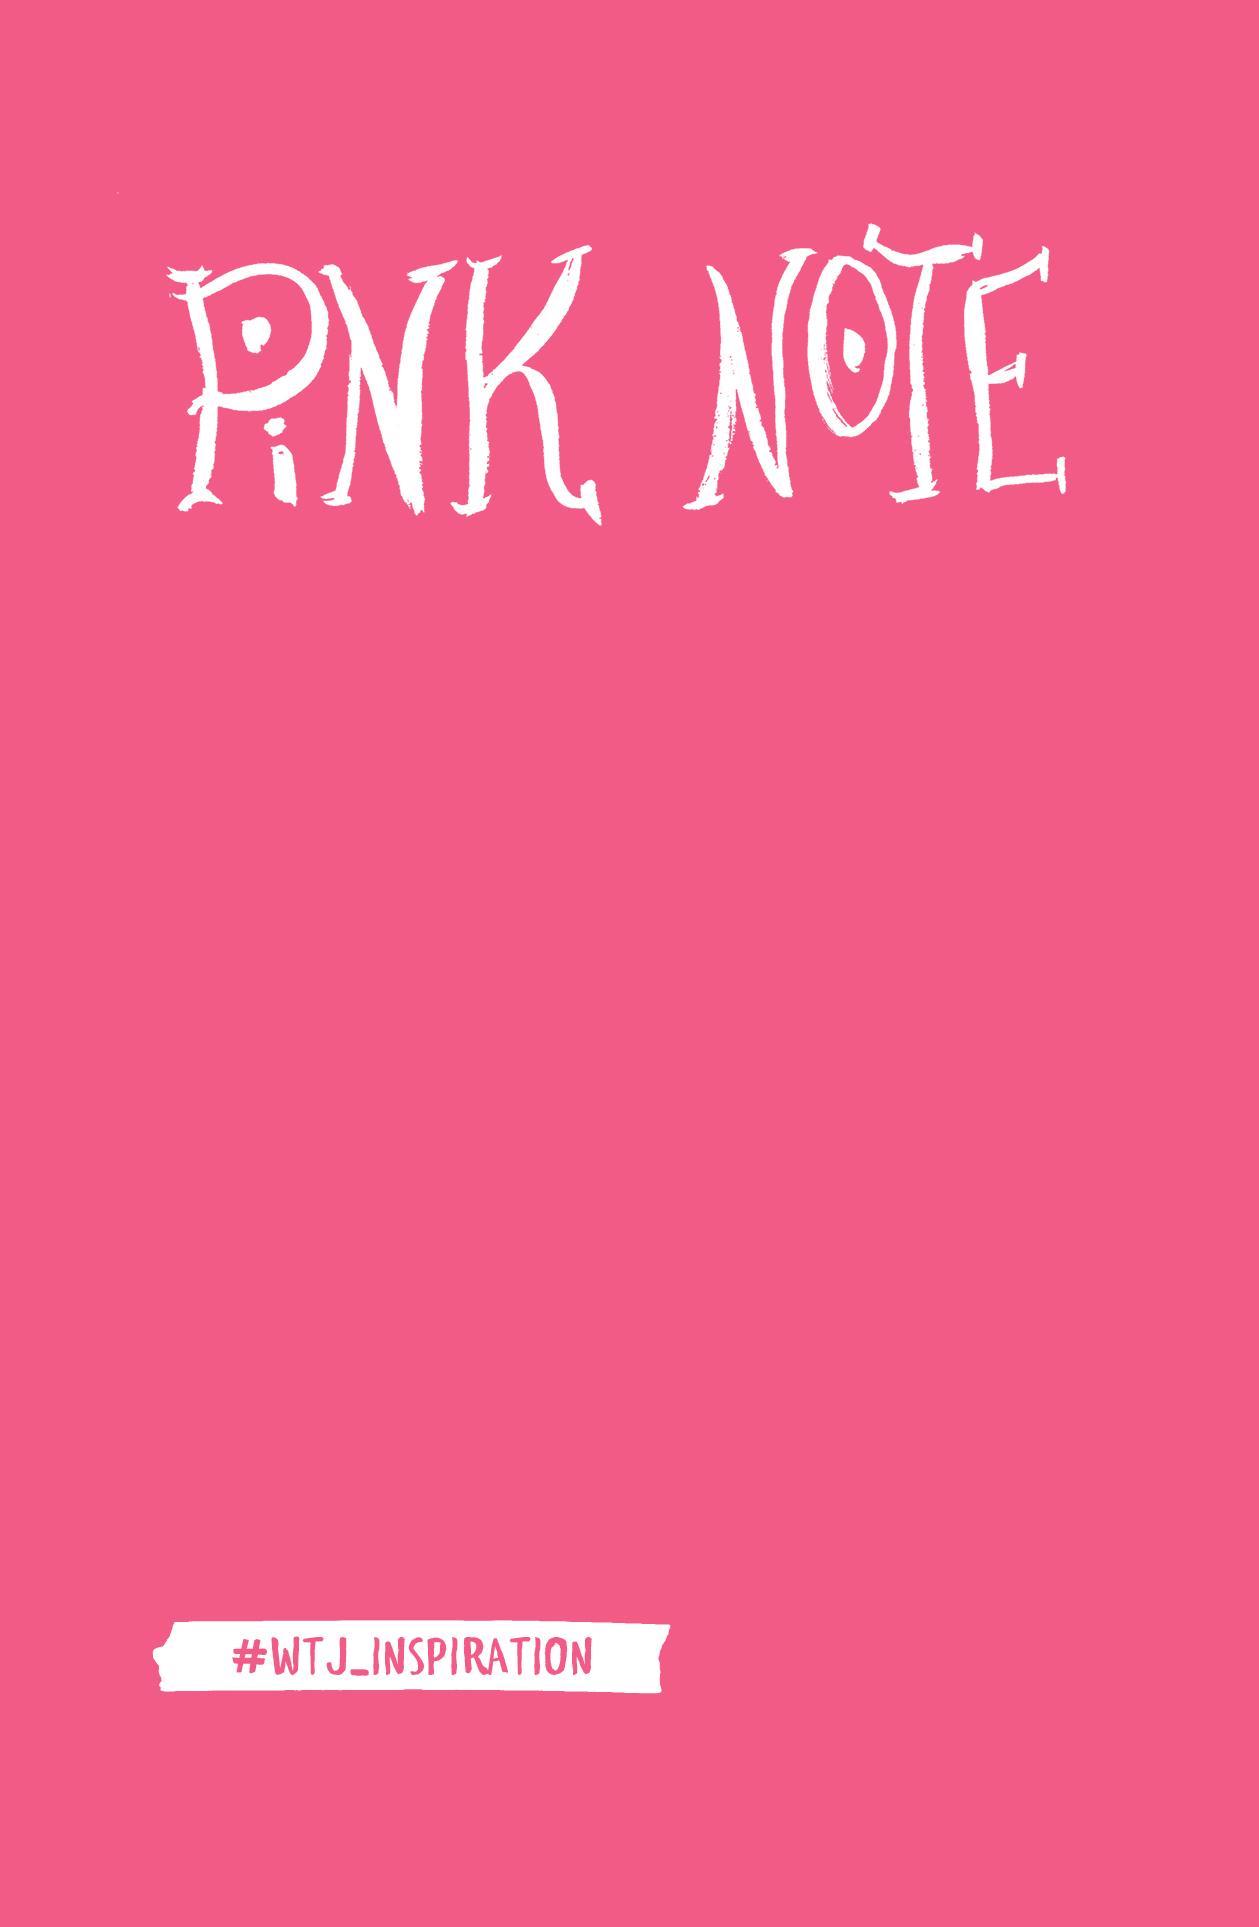 Pink Note. Романтичный блокнот с розовыми страницами silver note креативный блокнот с серебряными страницами мяг обл а5 192 стр